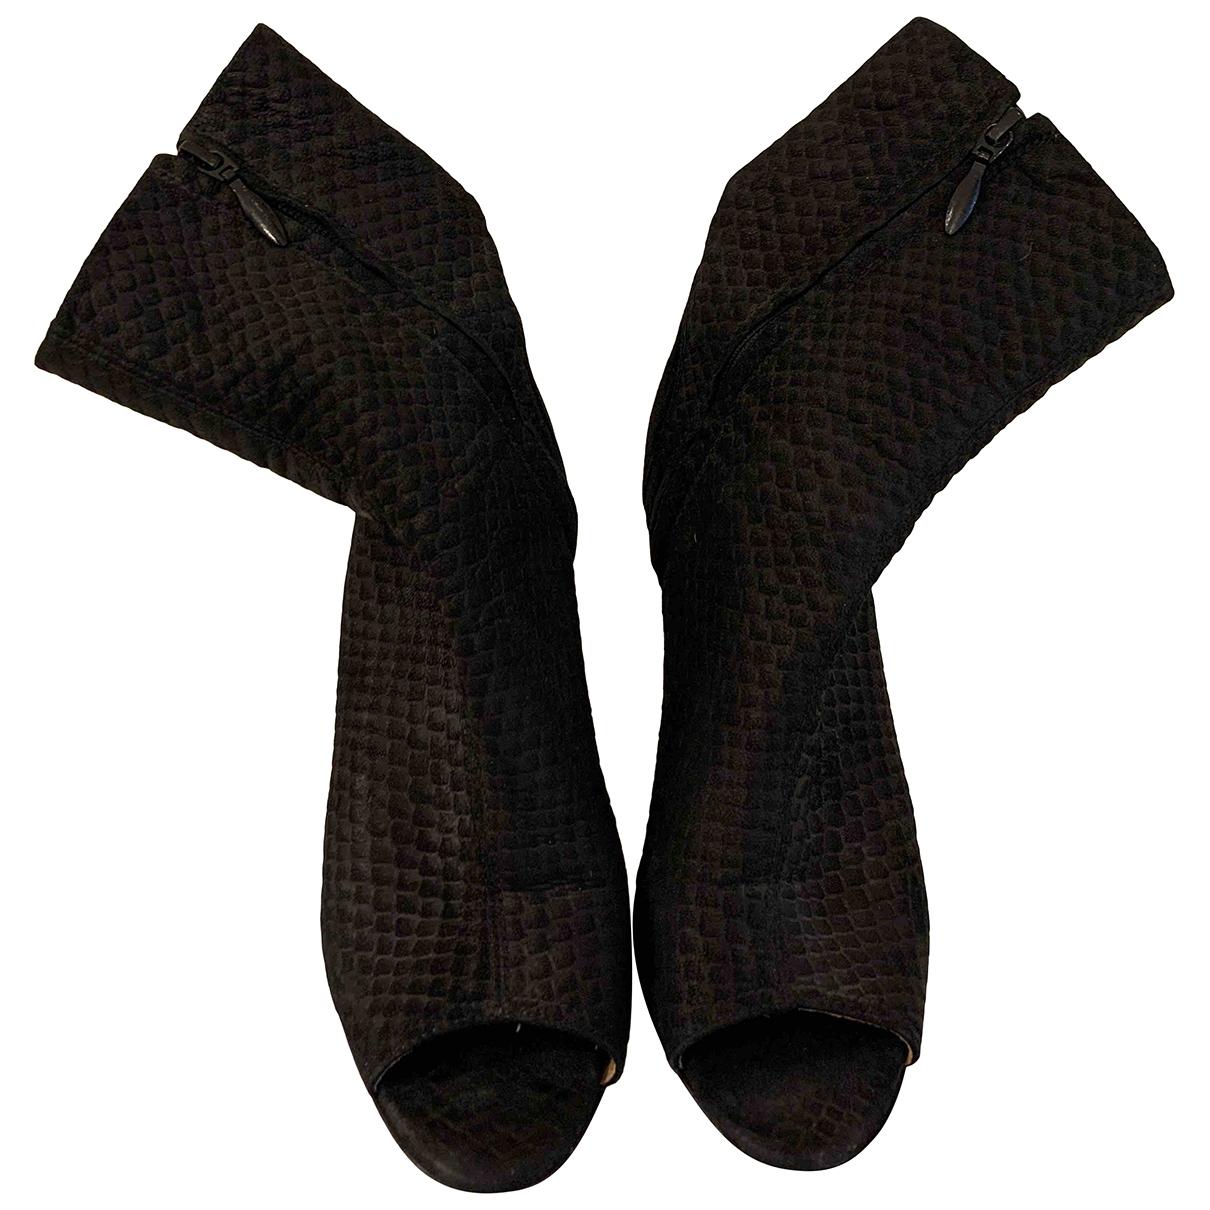 Acne Studios \N Black Tweed Ankle boots for Women 37 EU